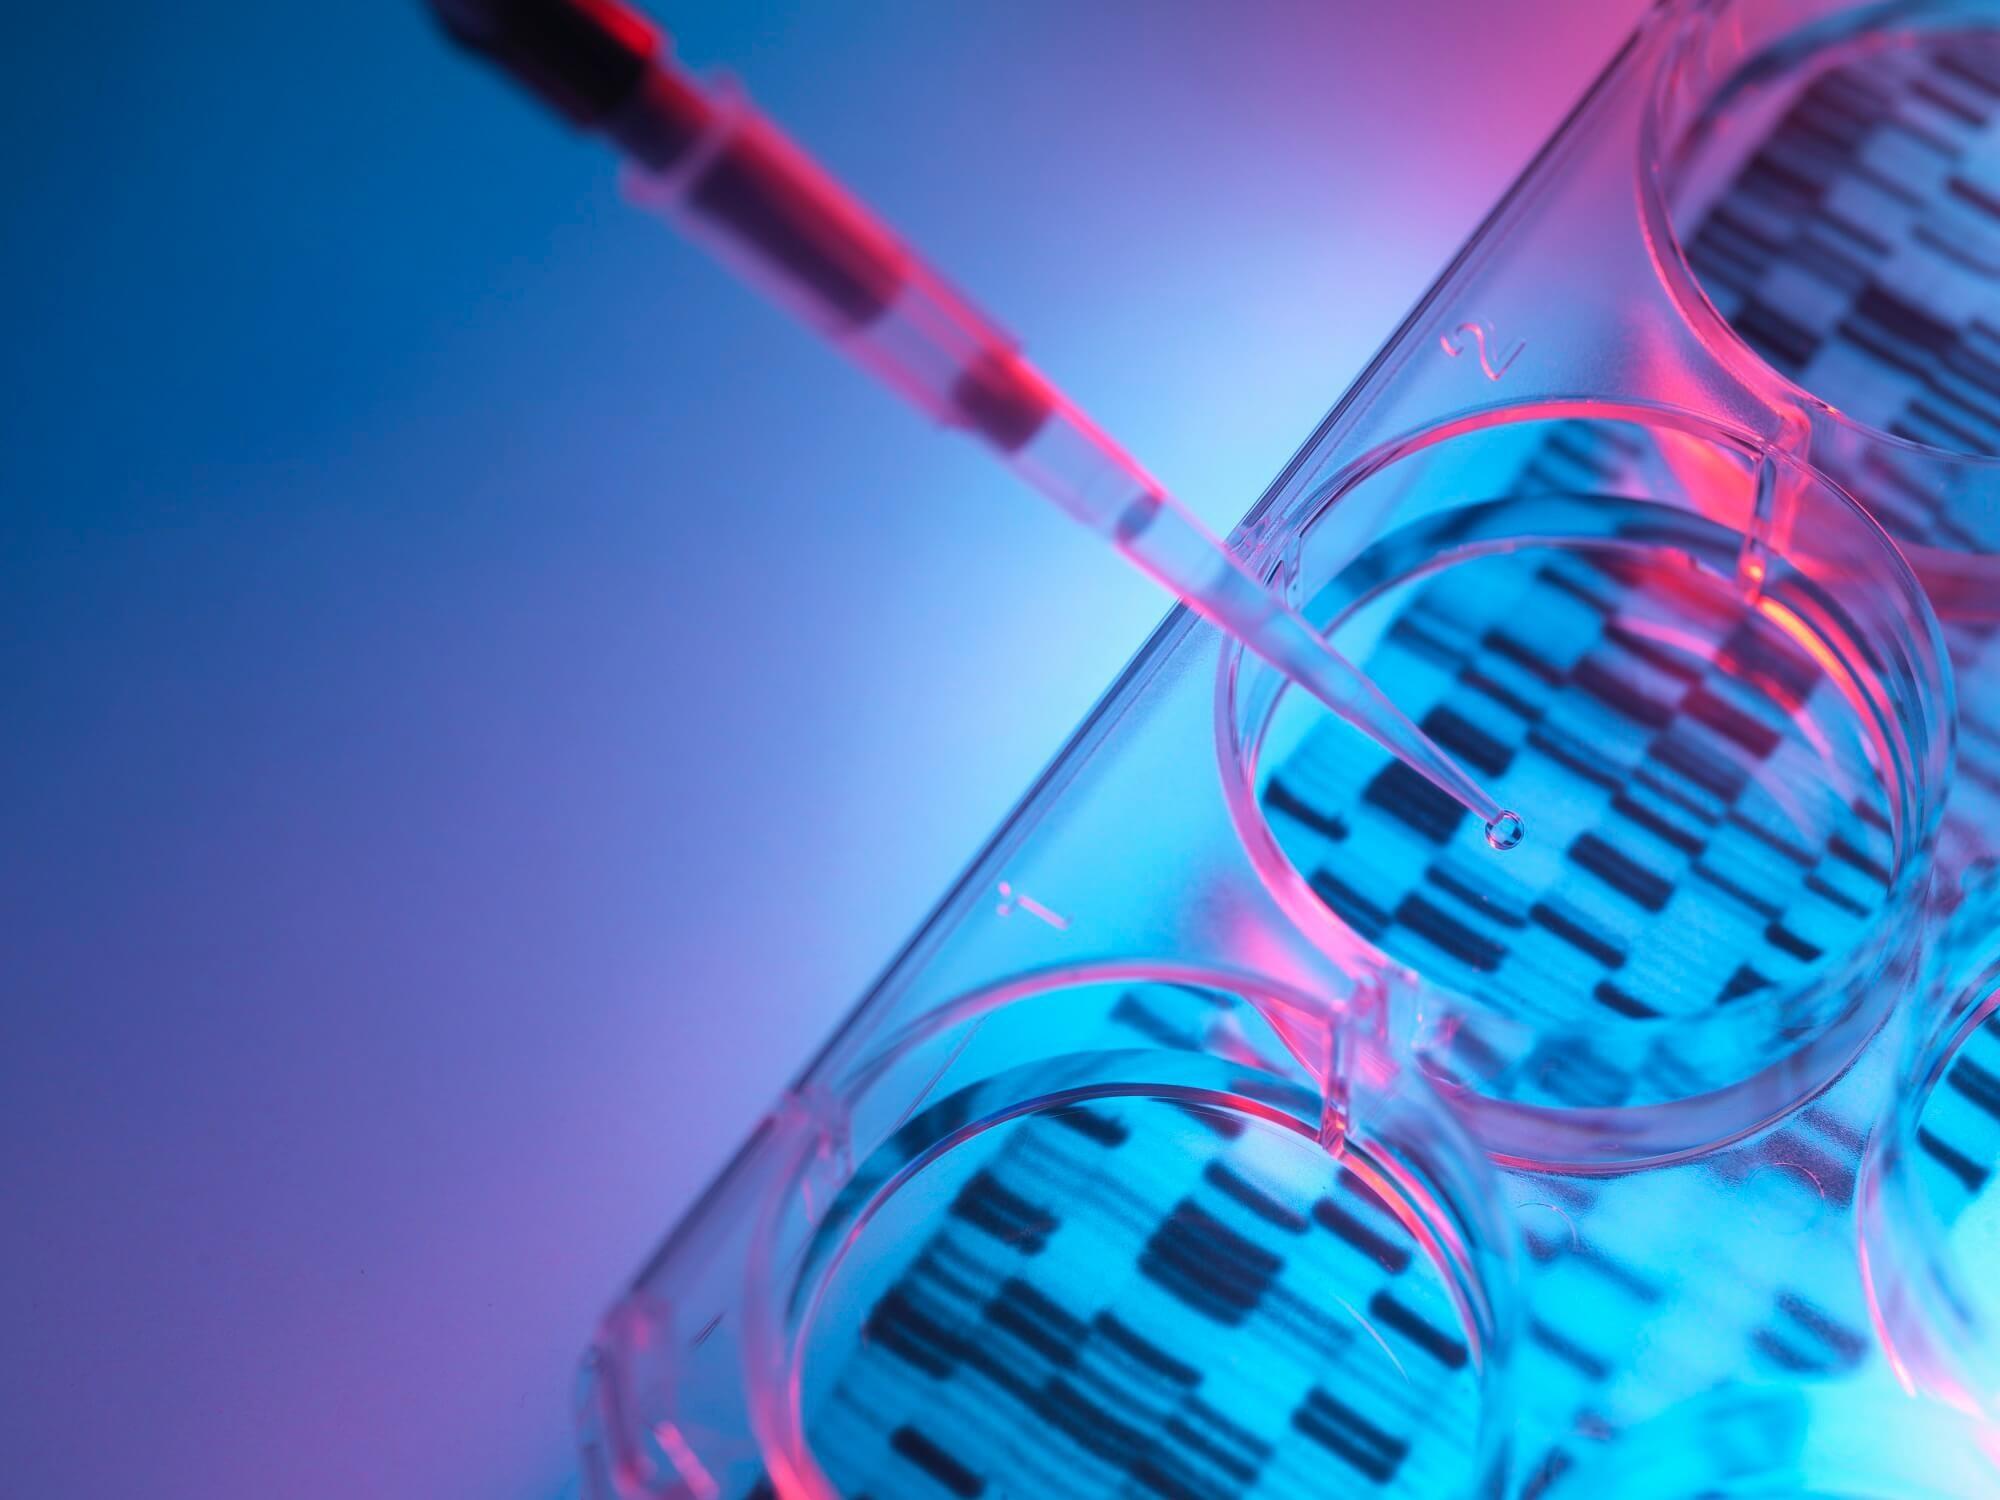 Hemochromatosis Penetrance Decreased Over Time in French Cohort